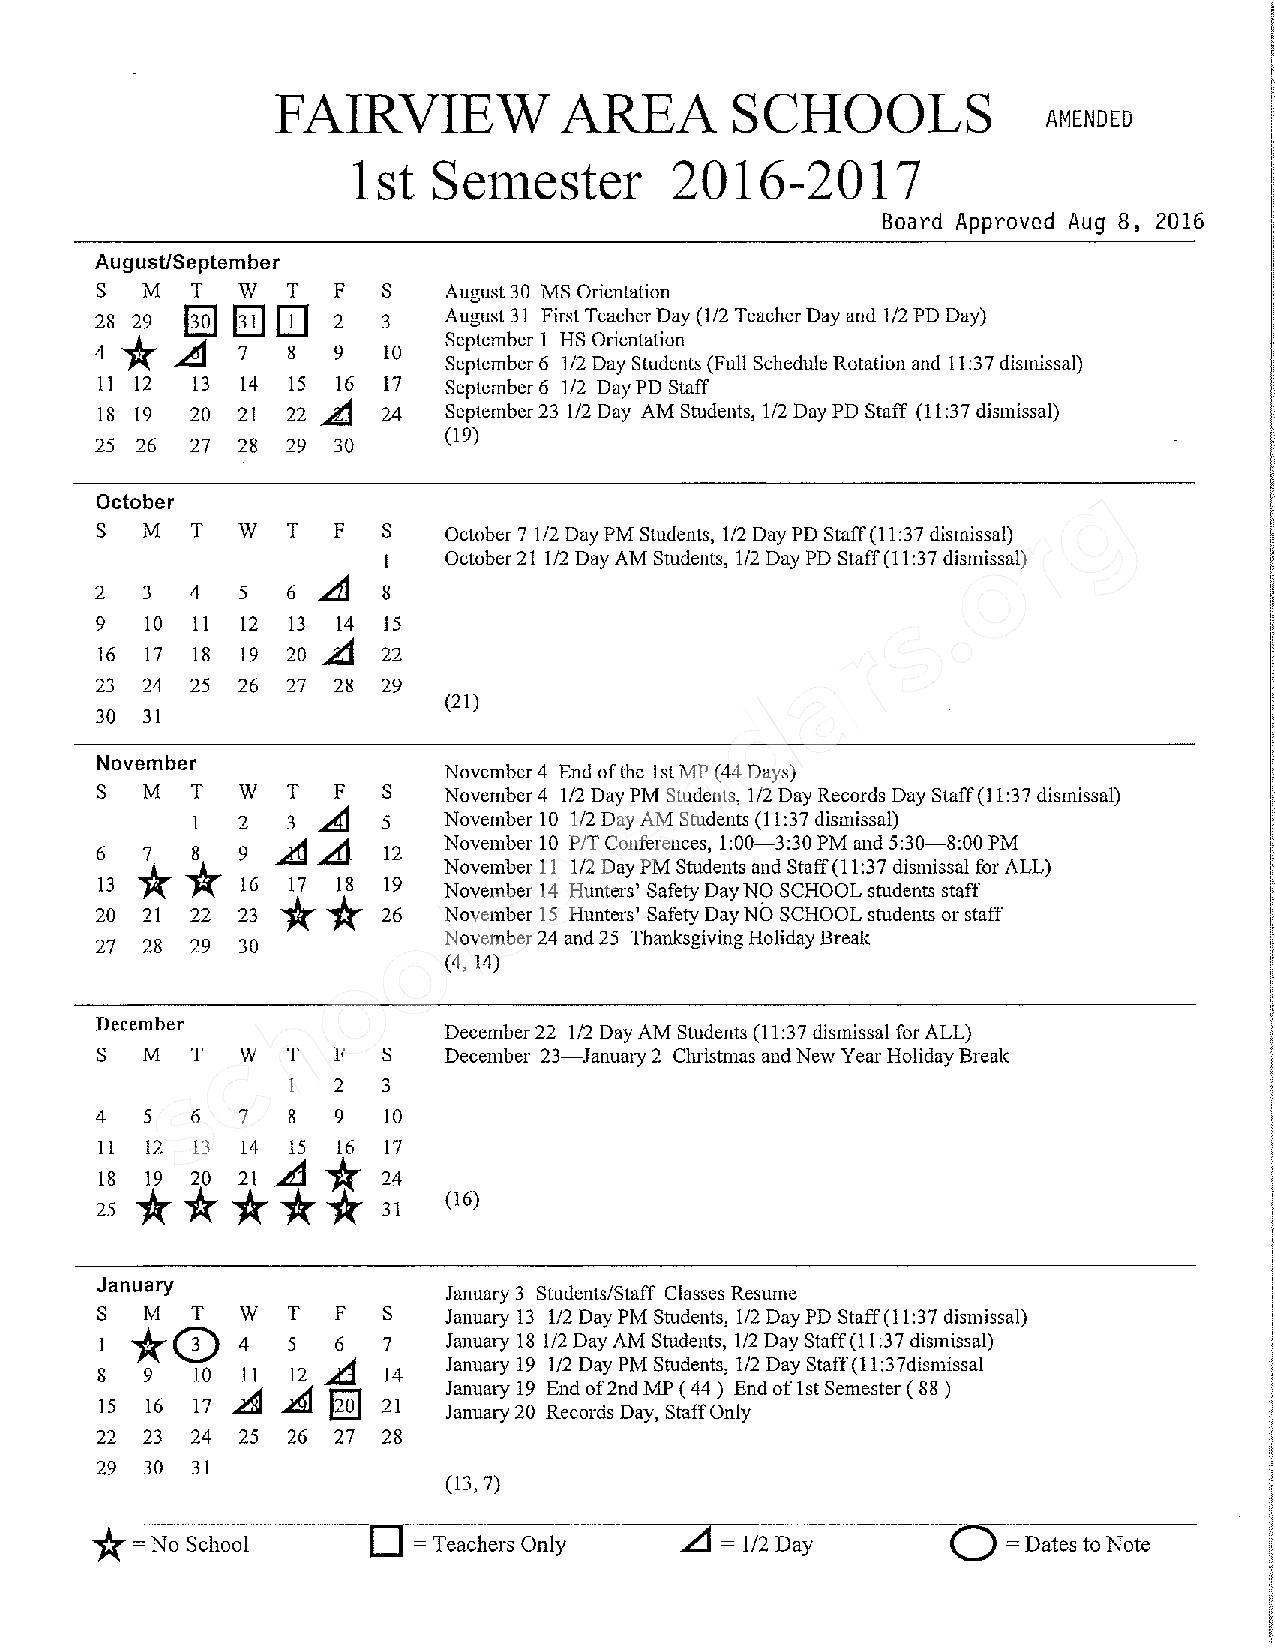 2016 - 2017 school calendar – Fairview Area School District – page 1